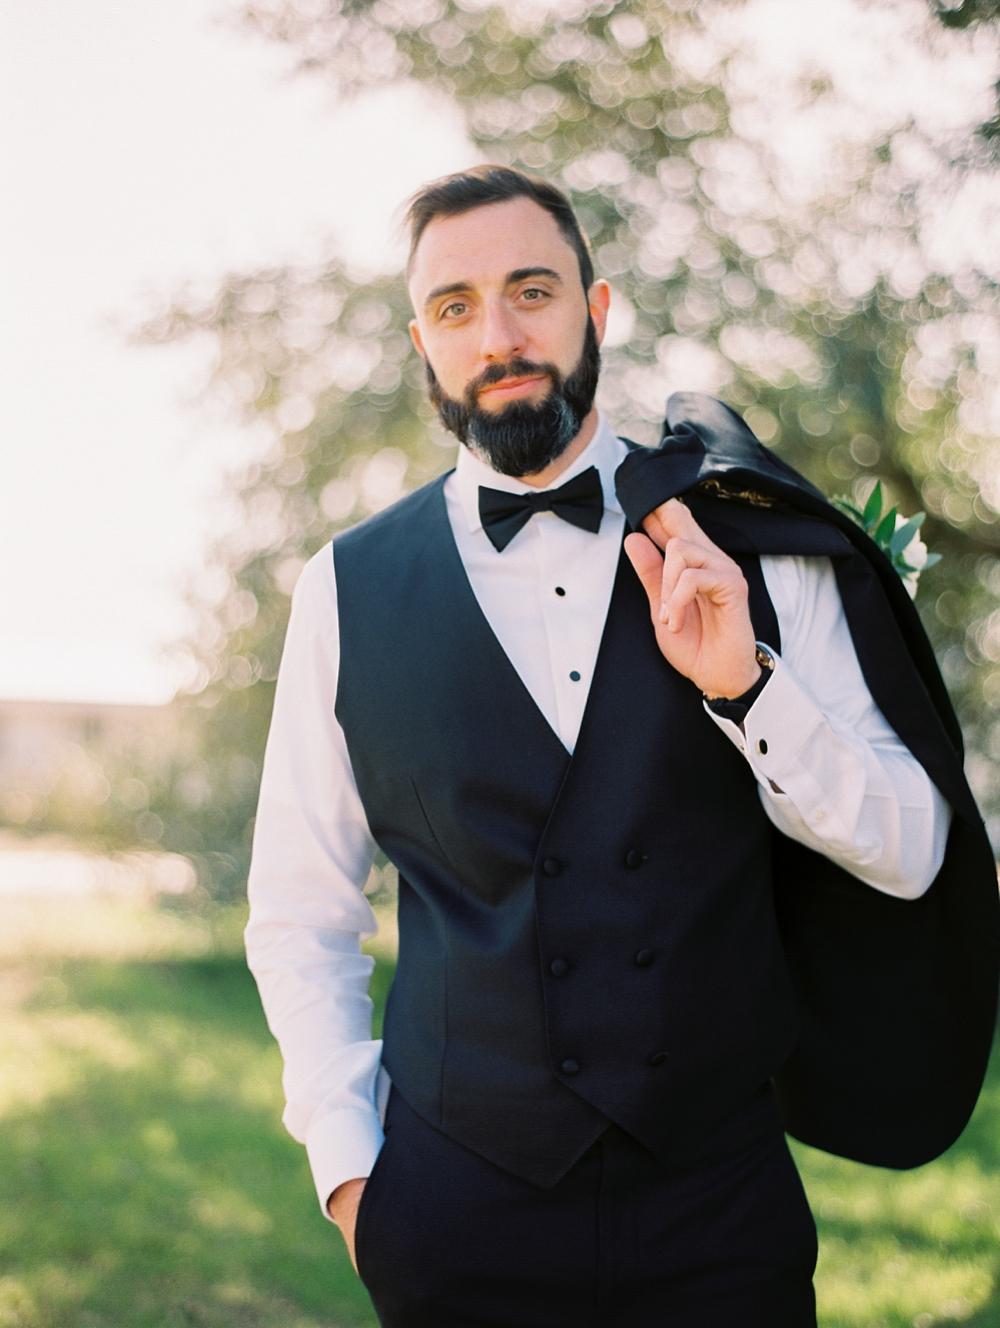 Kristin-La-Voie-Photography-austin-houston-texas-wedding-photographer-the-oaks-at-high-hill -283